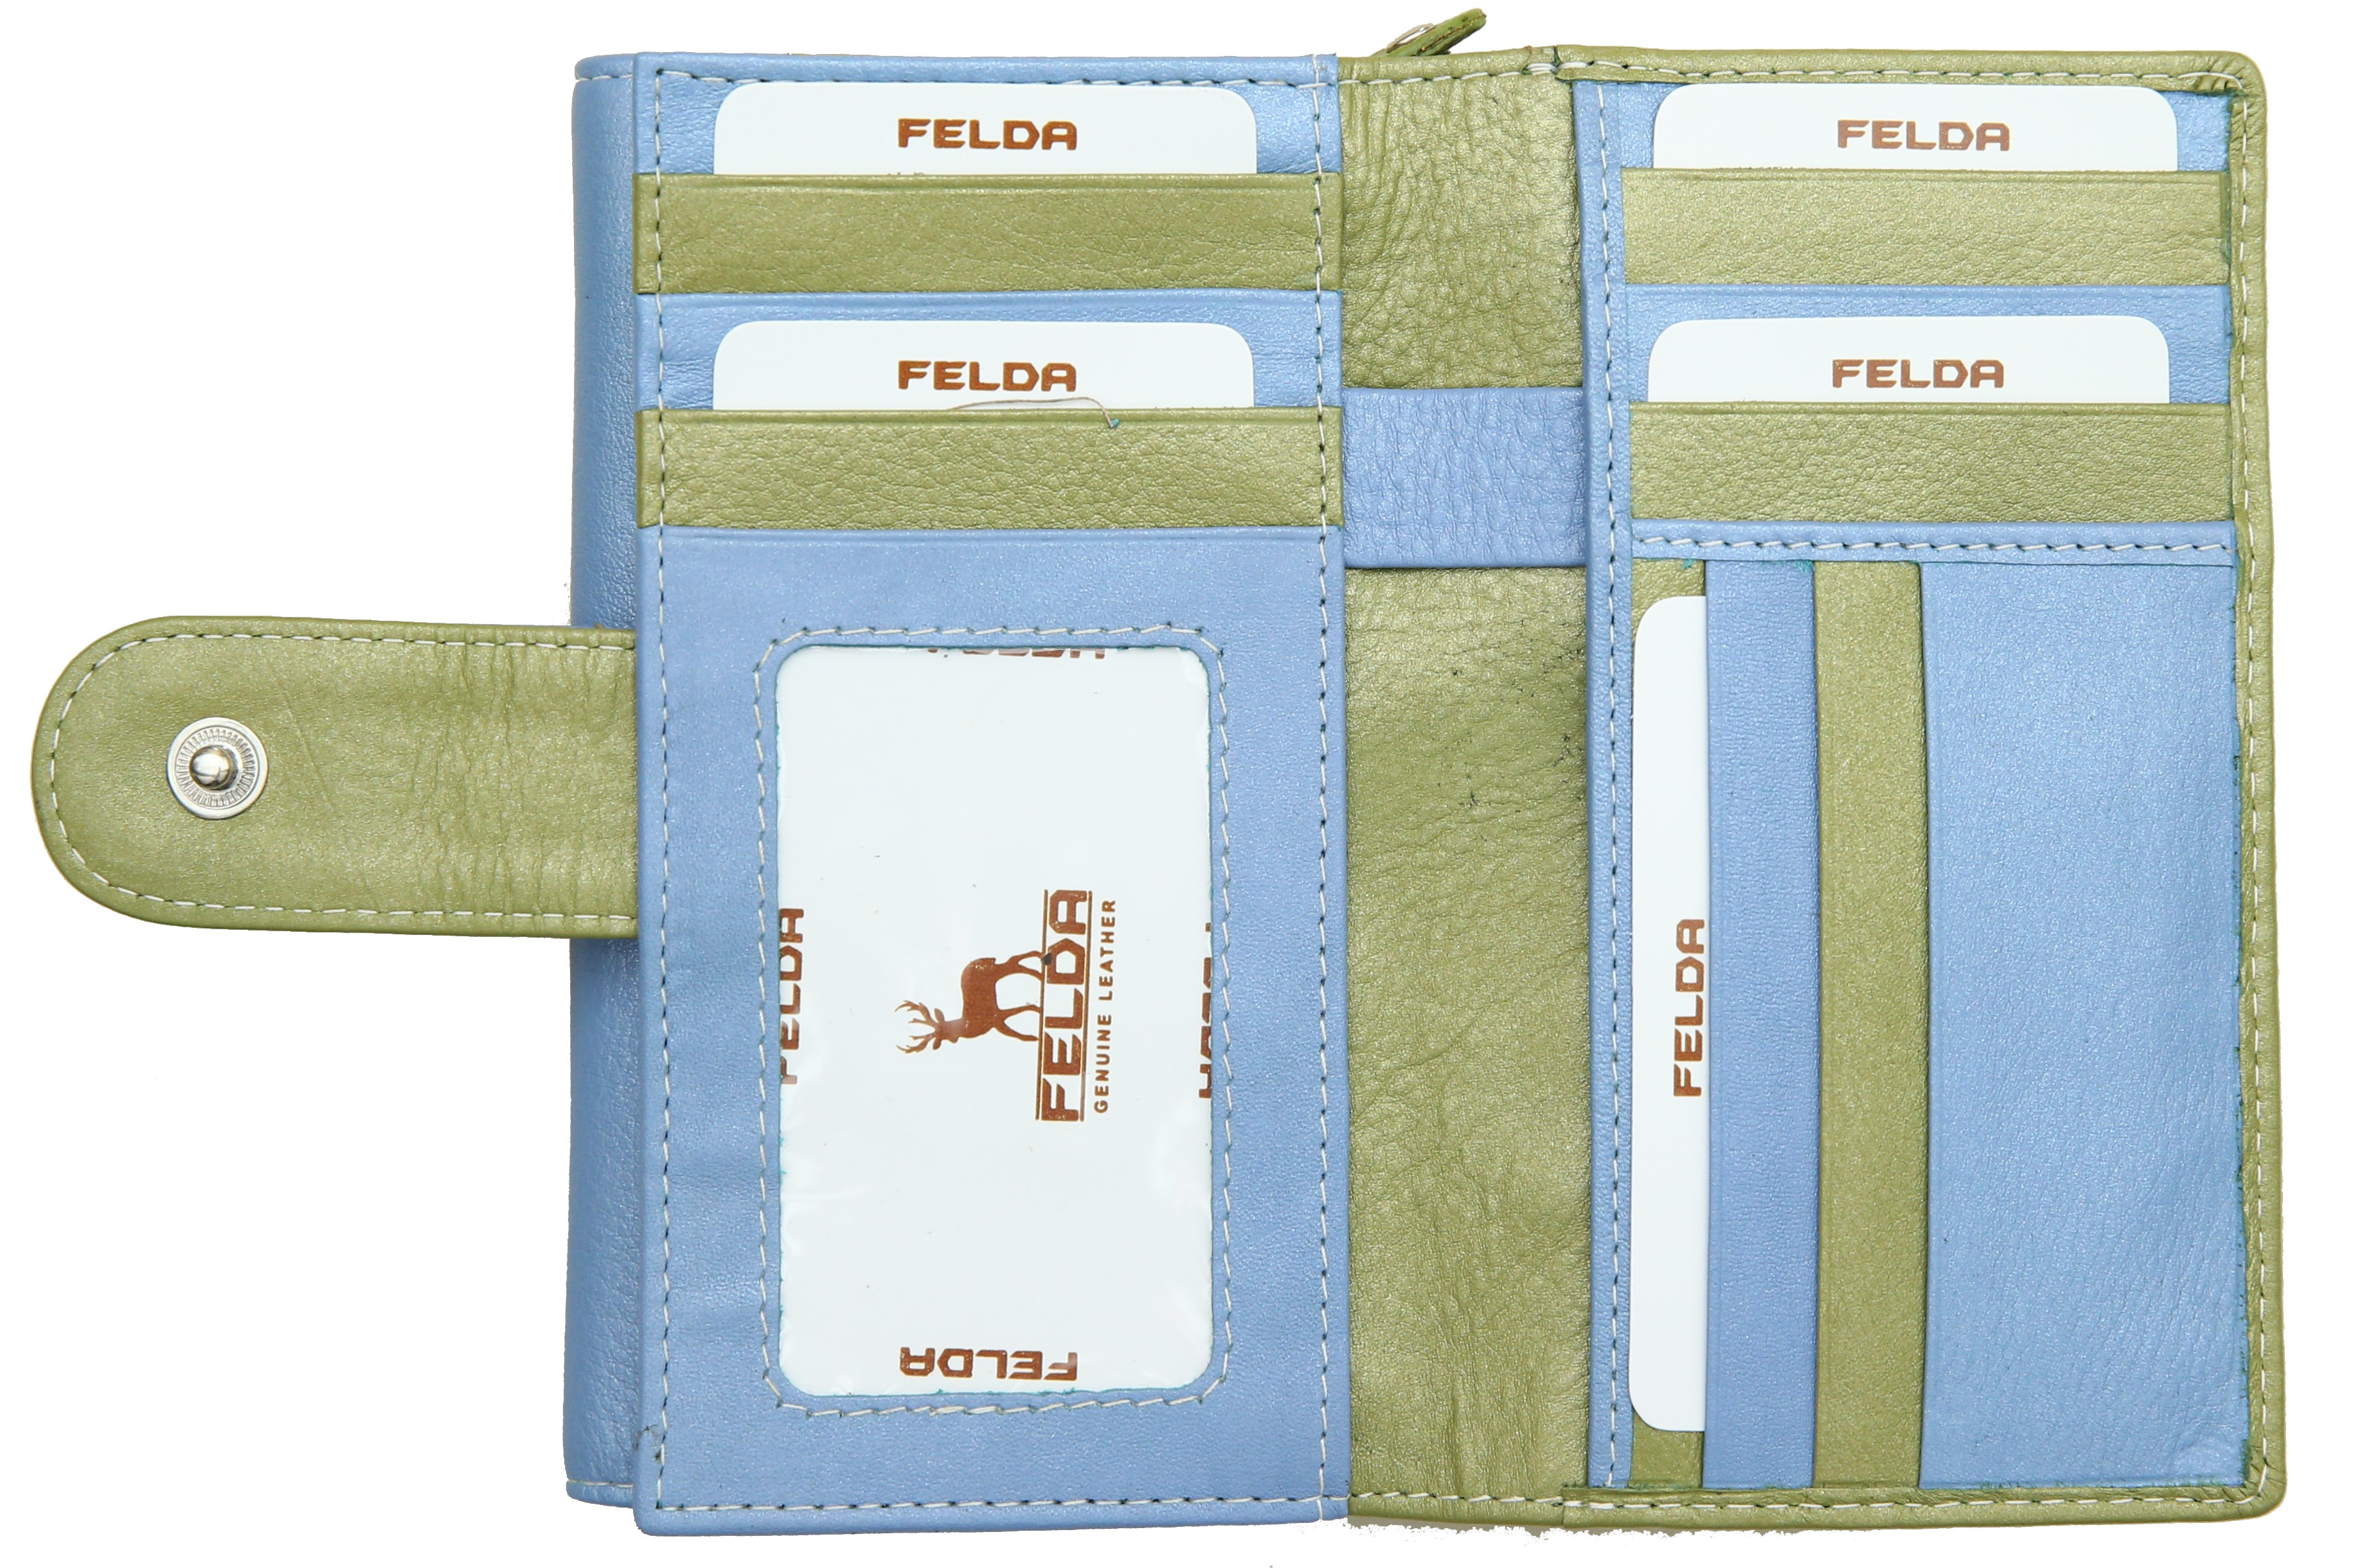 Felda-Portefeuille-pour-cartes-de-credit-cuir-souple-plusieurs-coloris miniature 24